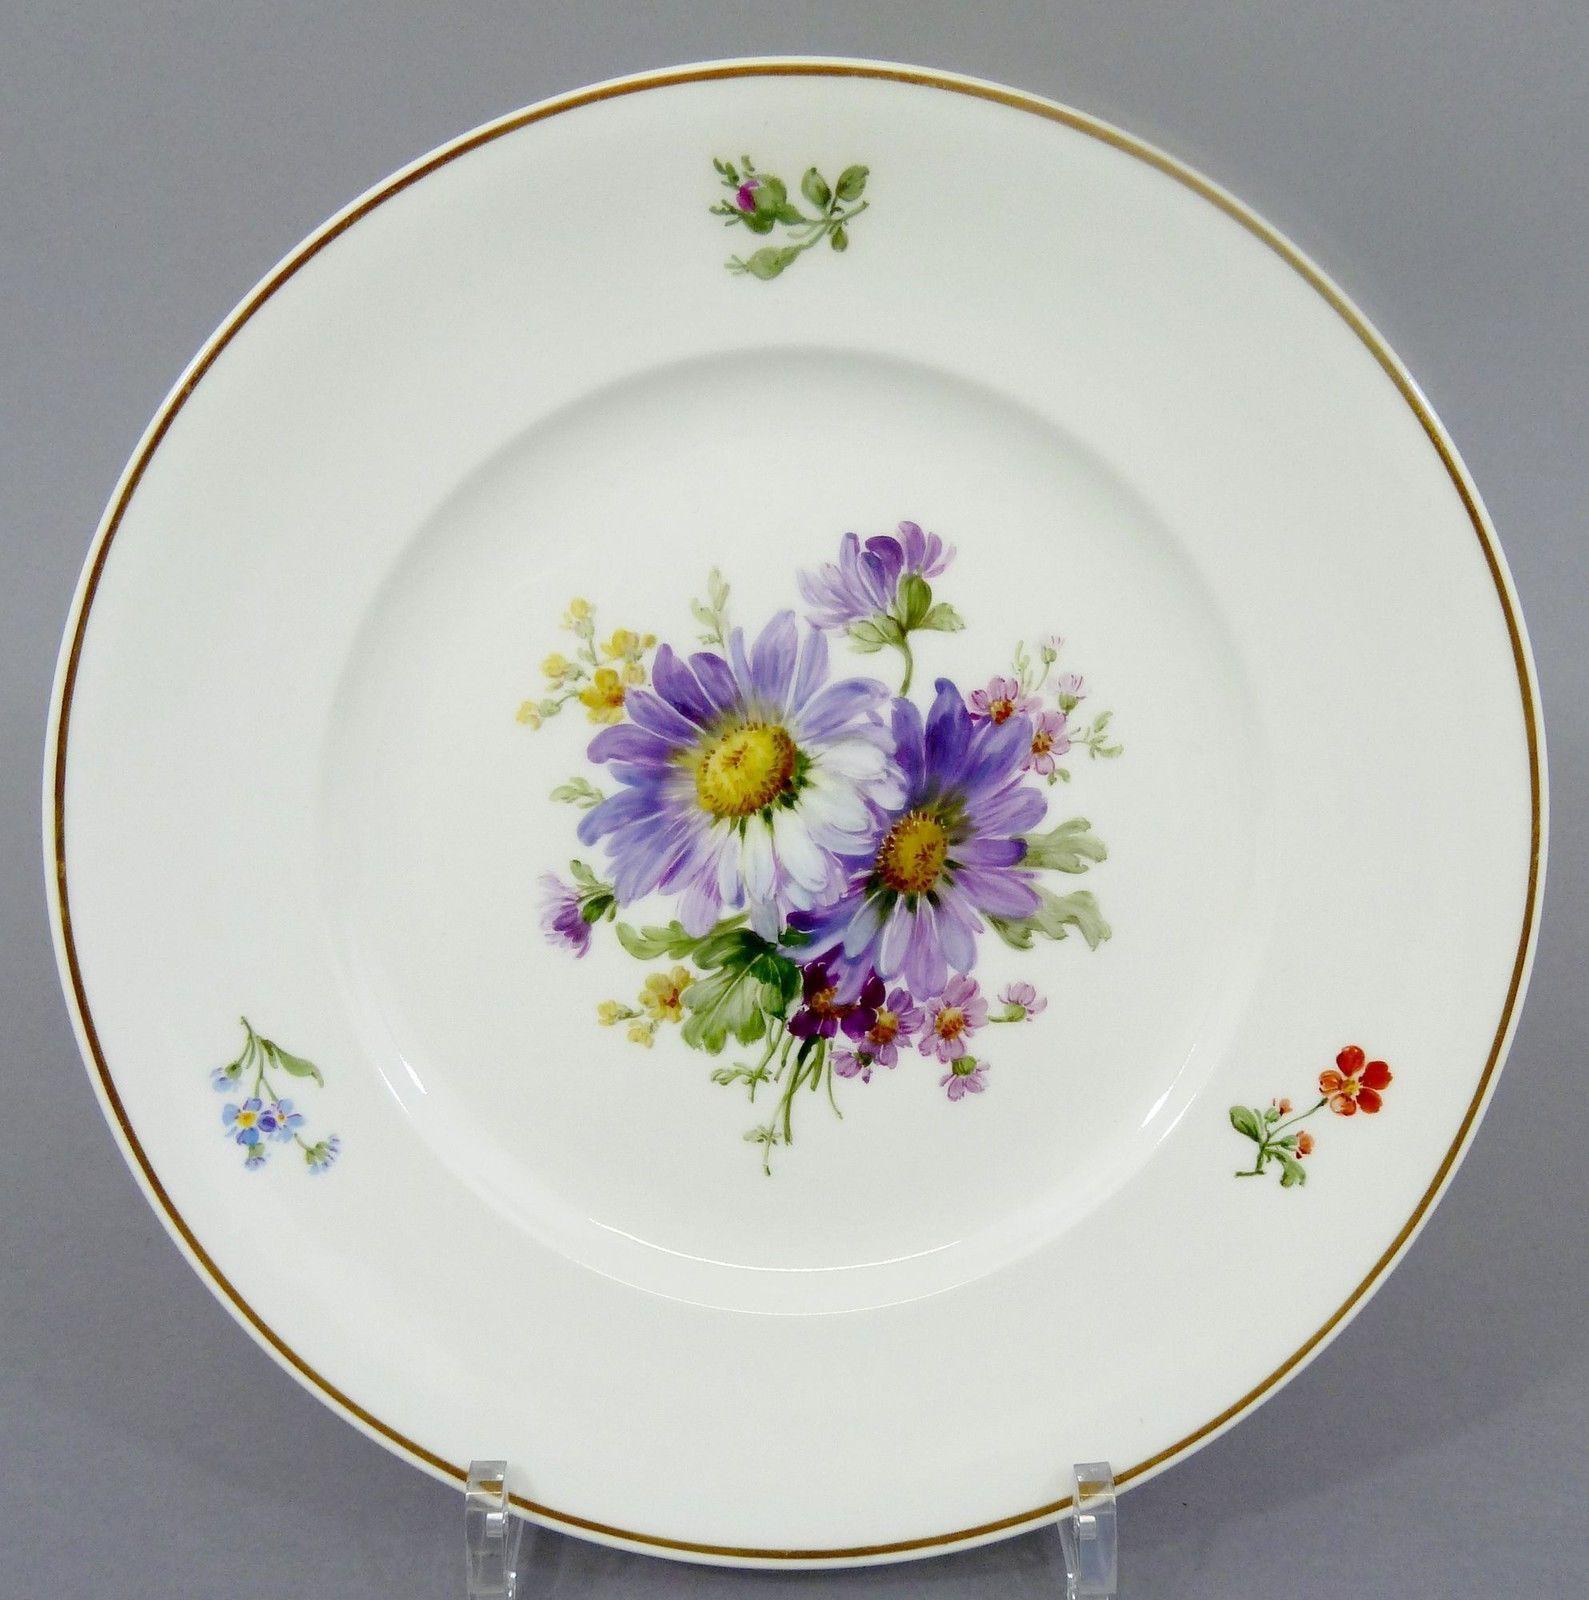 KPM Berlin Teller mit bunter Blumenmalerei, um 1900, D= 24,5cm #4 in Antiquitäten & Kunst, Porzellan & Keramik, Porzellan   eBay